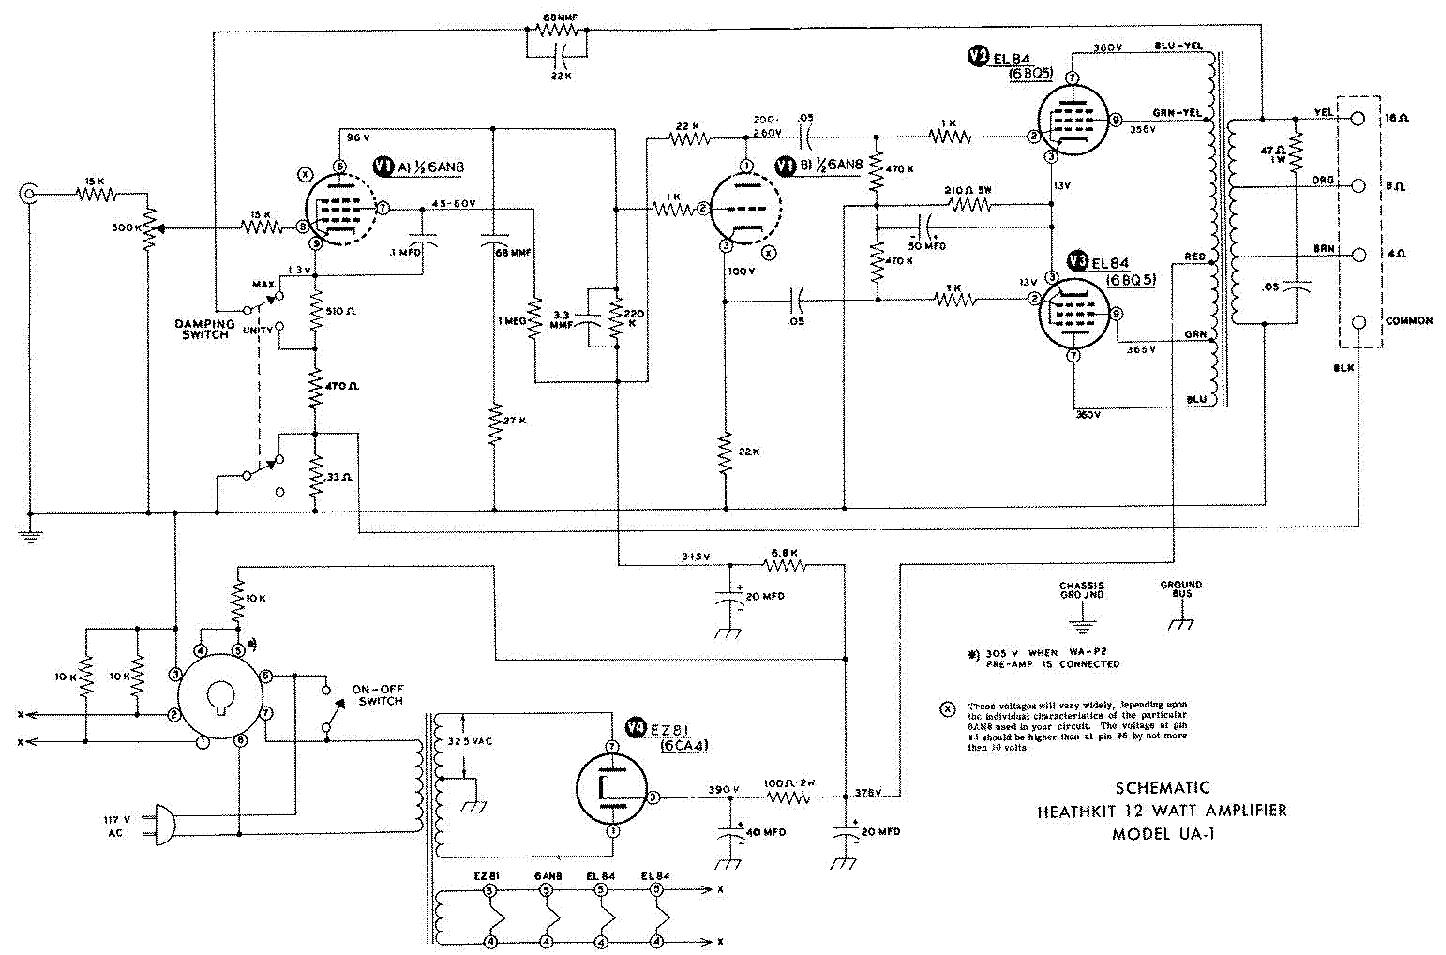 12w audio amplifier new model wiring diagram